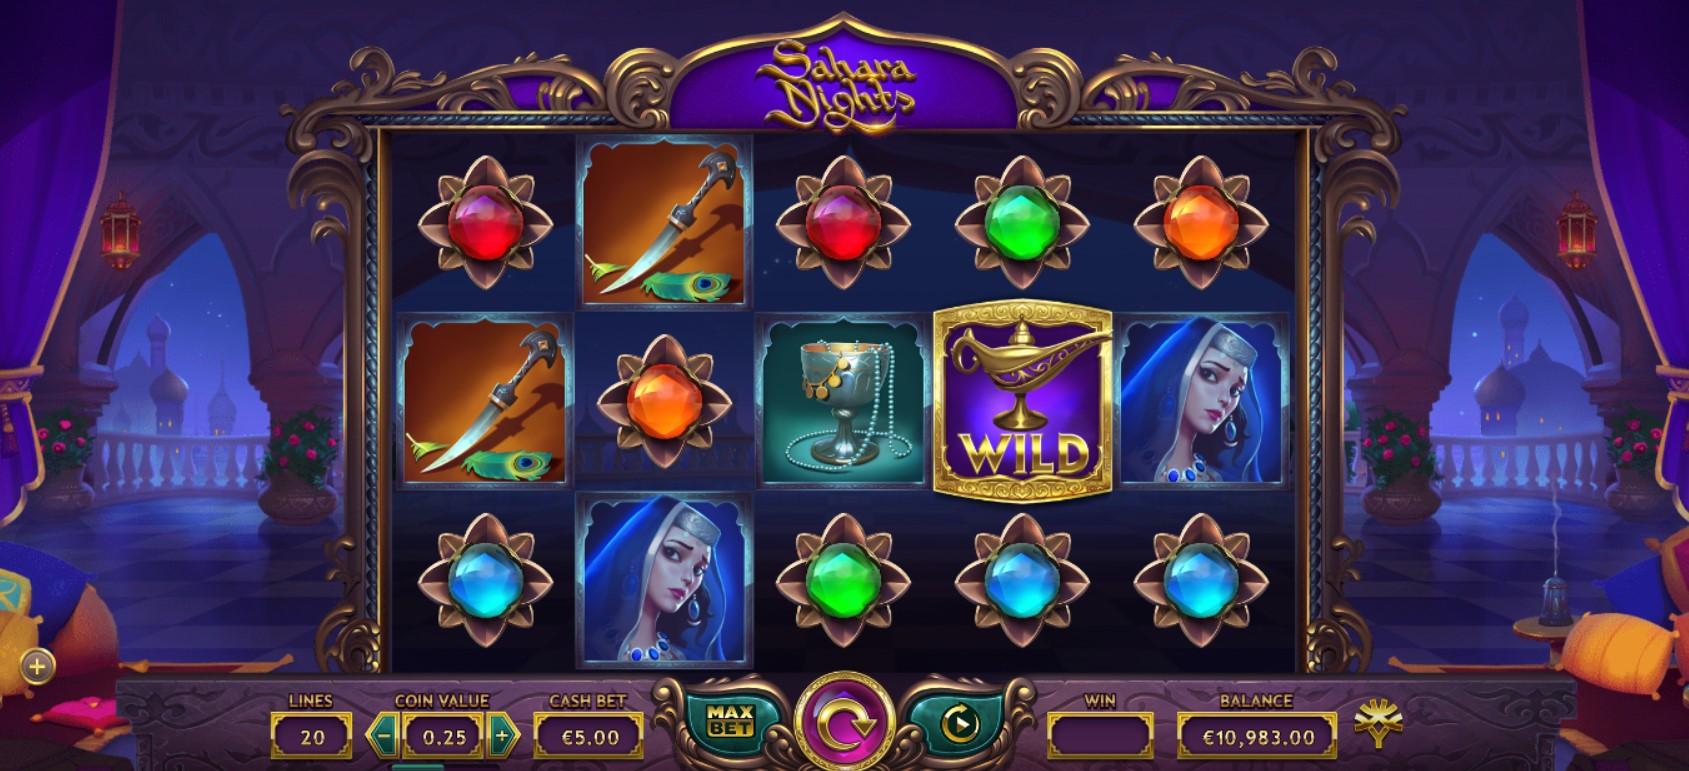 Sahara Nights Slot Gameplay